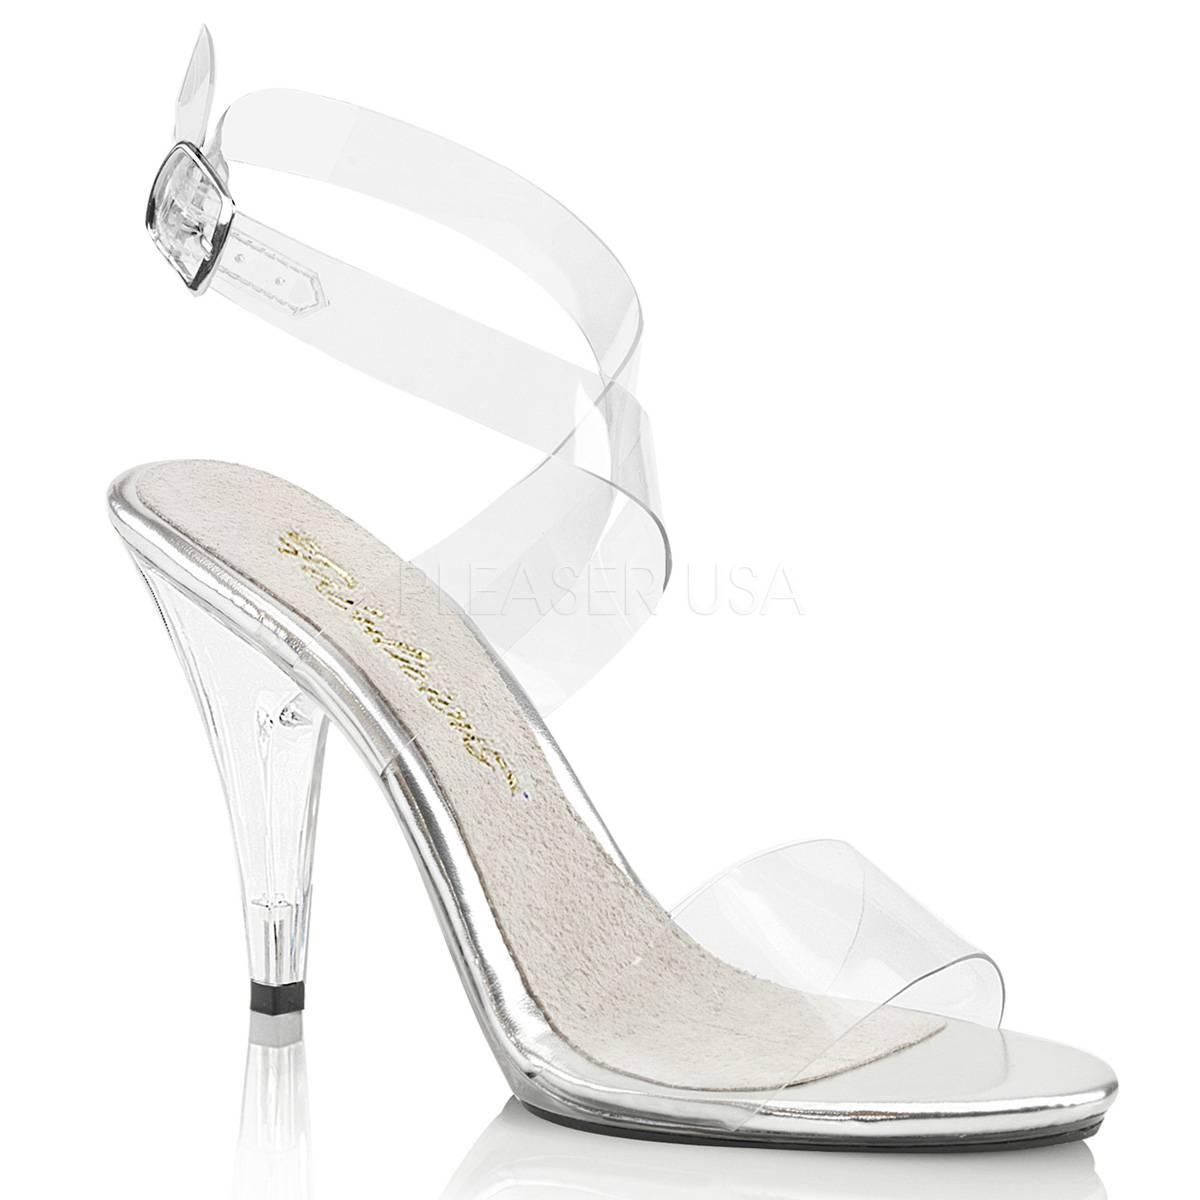 CARESS 412 ° Damen Sandalette ° TransparentMatt ° ... Fabulicious ... ° 2d7ef6